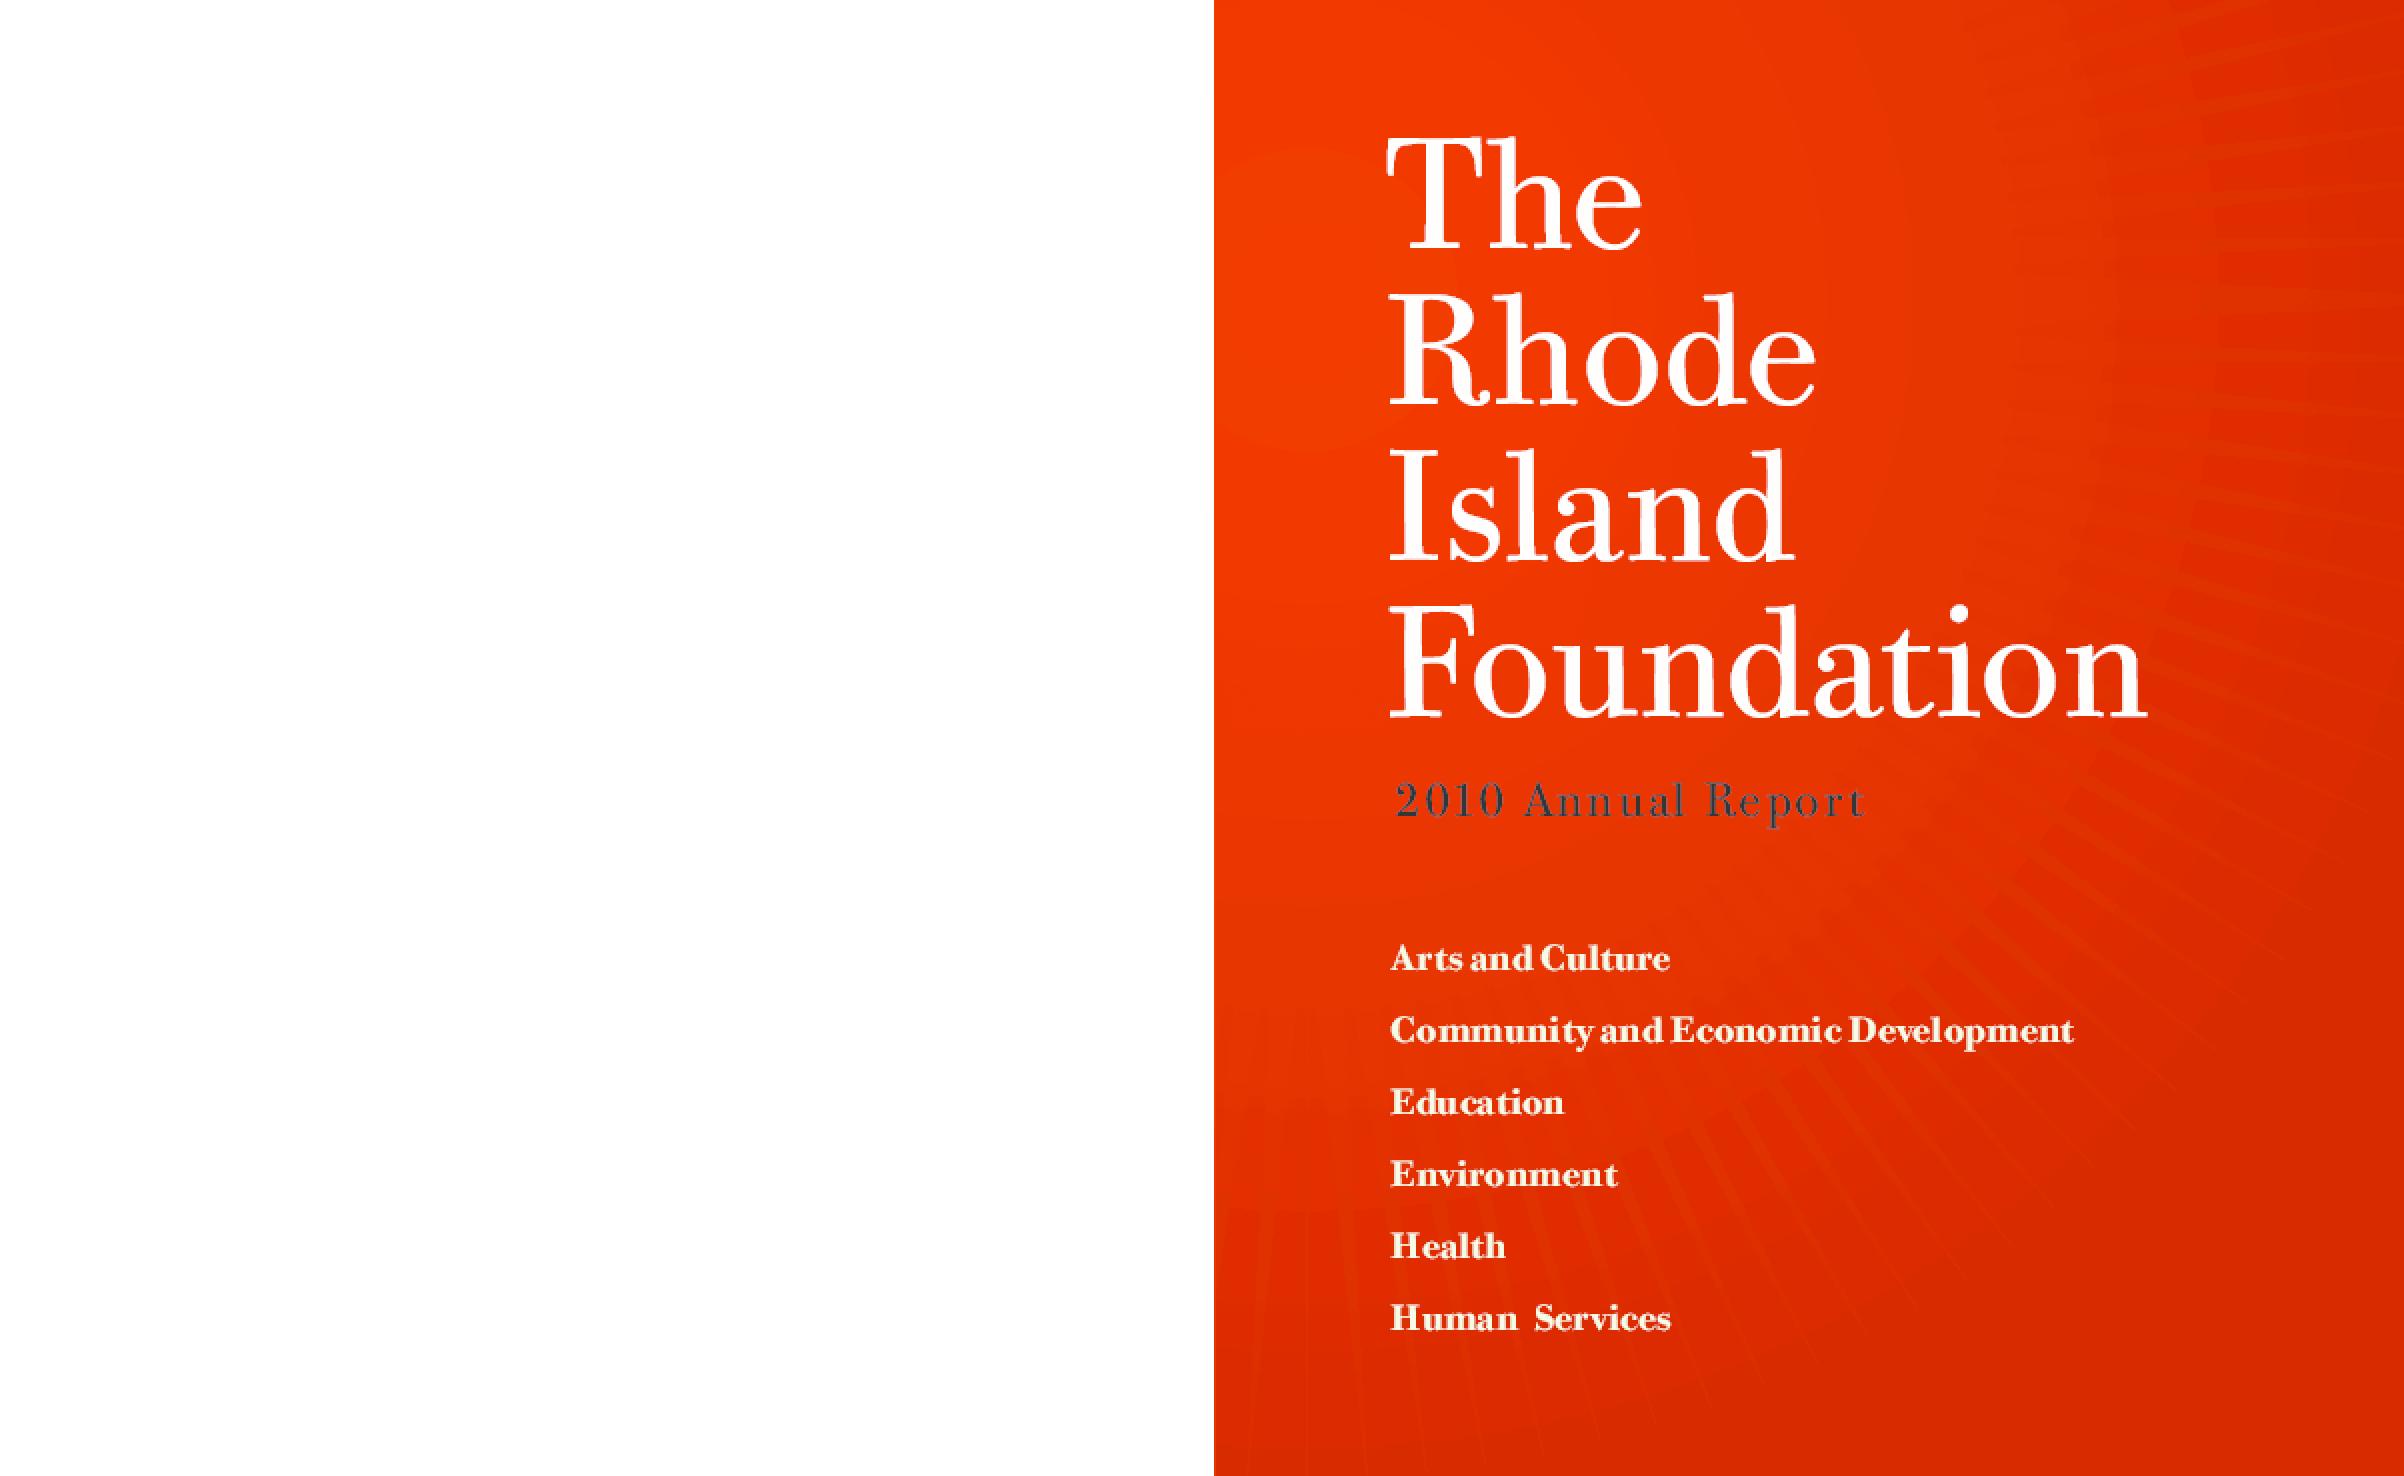 Rhode Island Foundation 2010 Annual Report